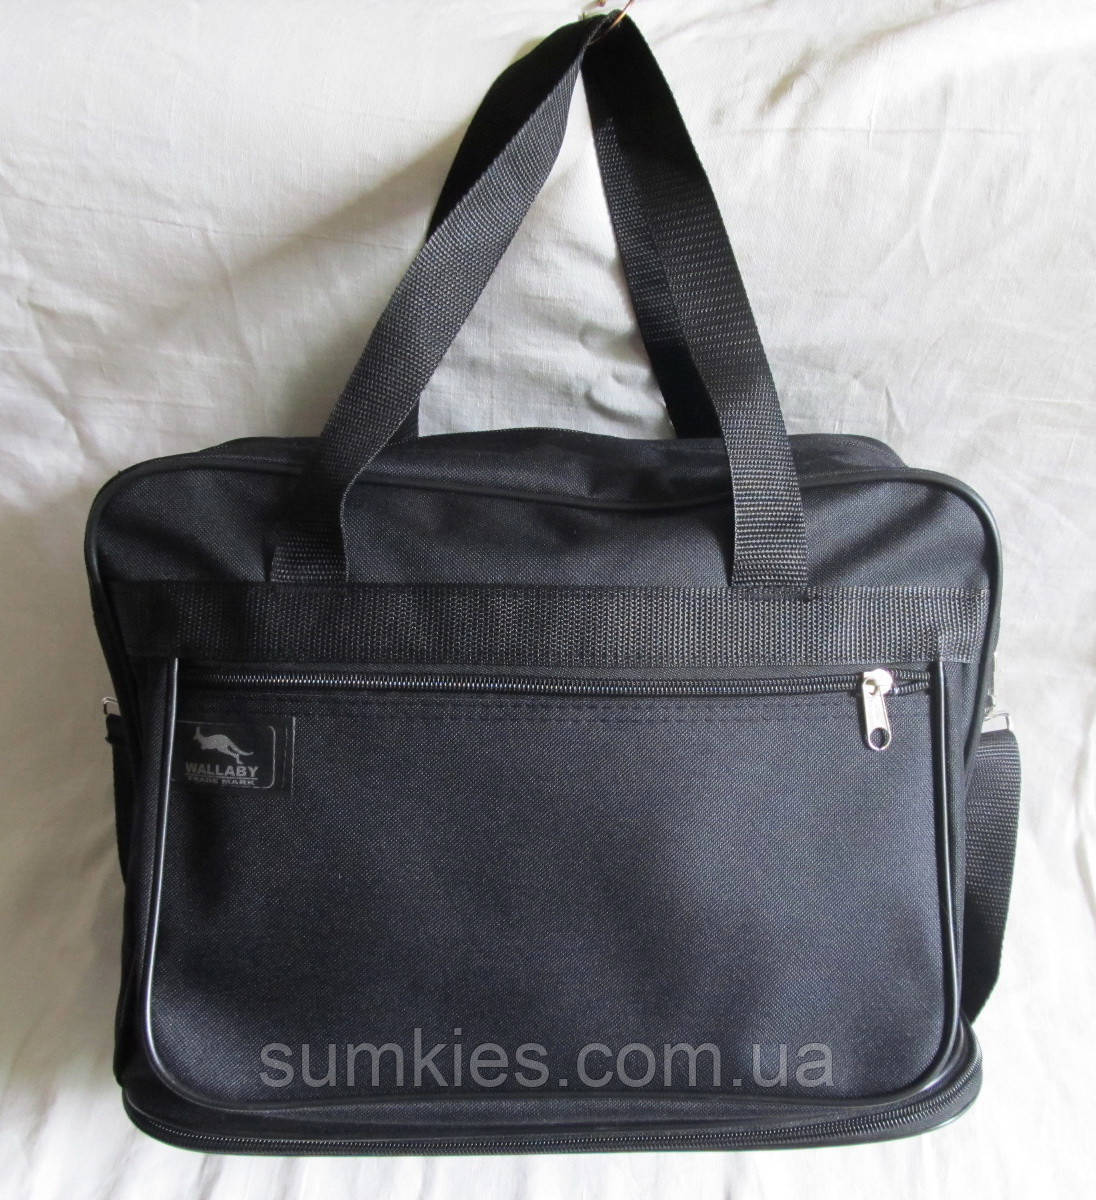 0ae59bd801c0 Мужская сумка Wallaby 2071 черная барсетка через плечо А4 с расширением  32х26+12х19см